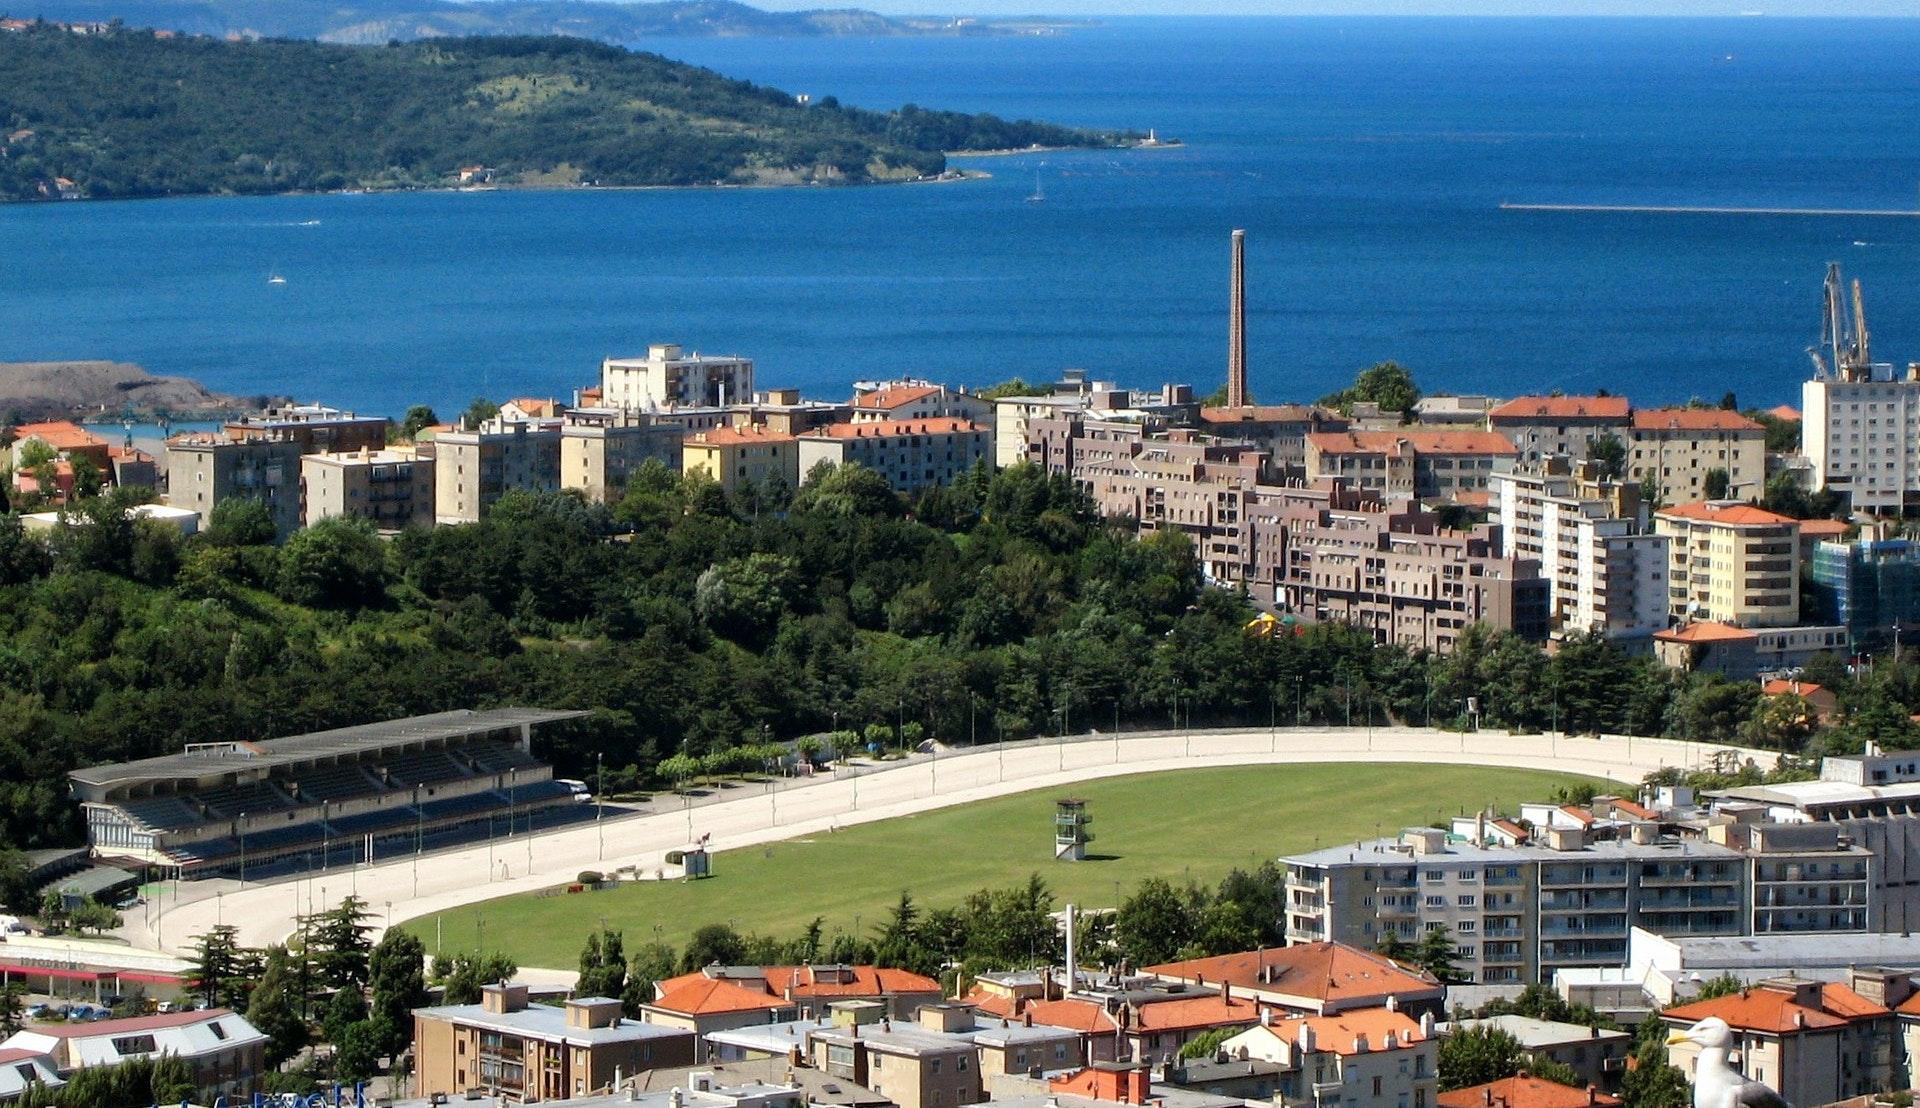 Trieste © David Mark, Pixabay